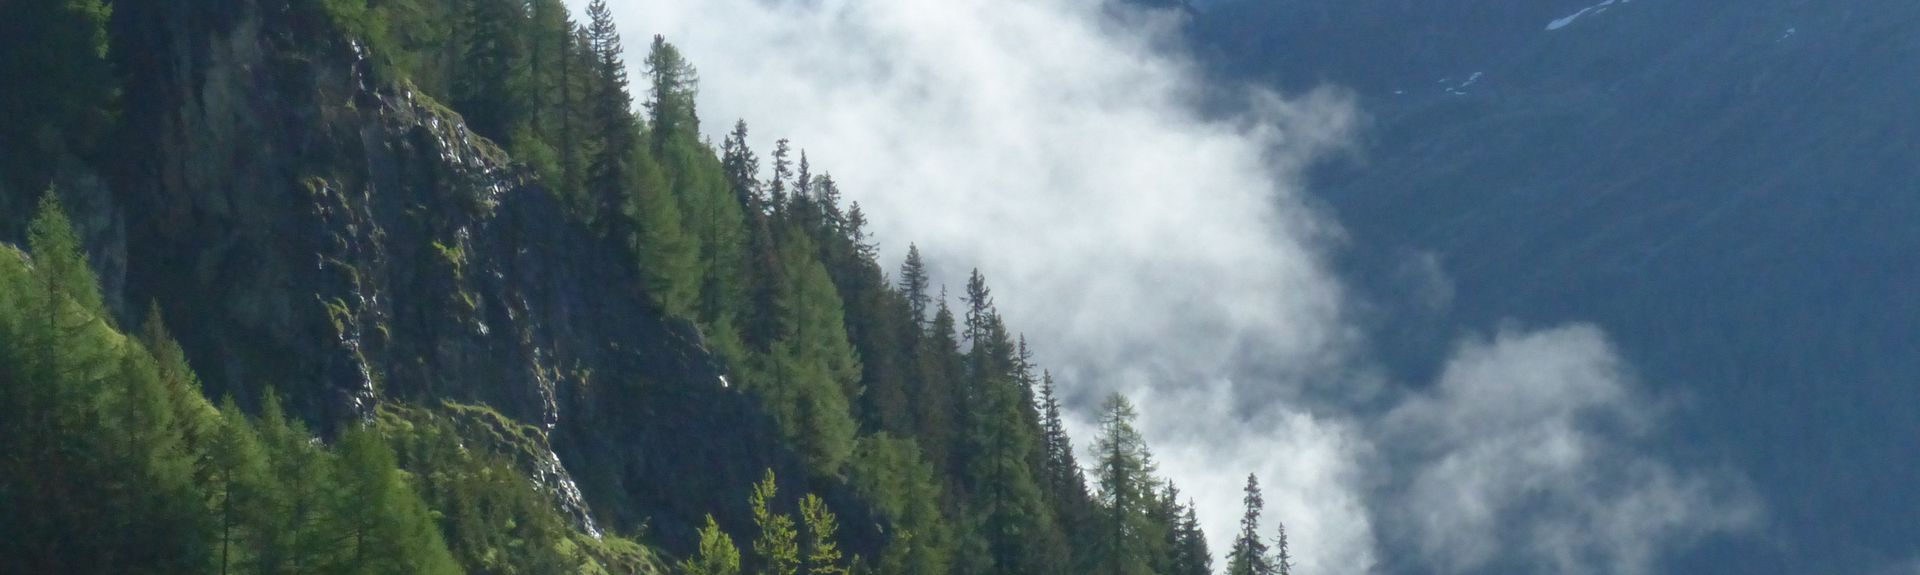 Hochpustertal, Tiroli, Itävalta